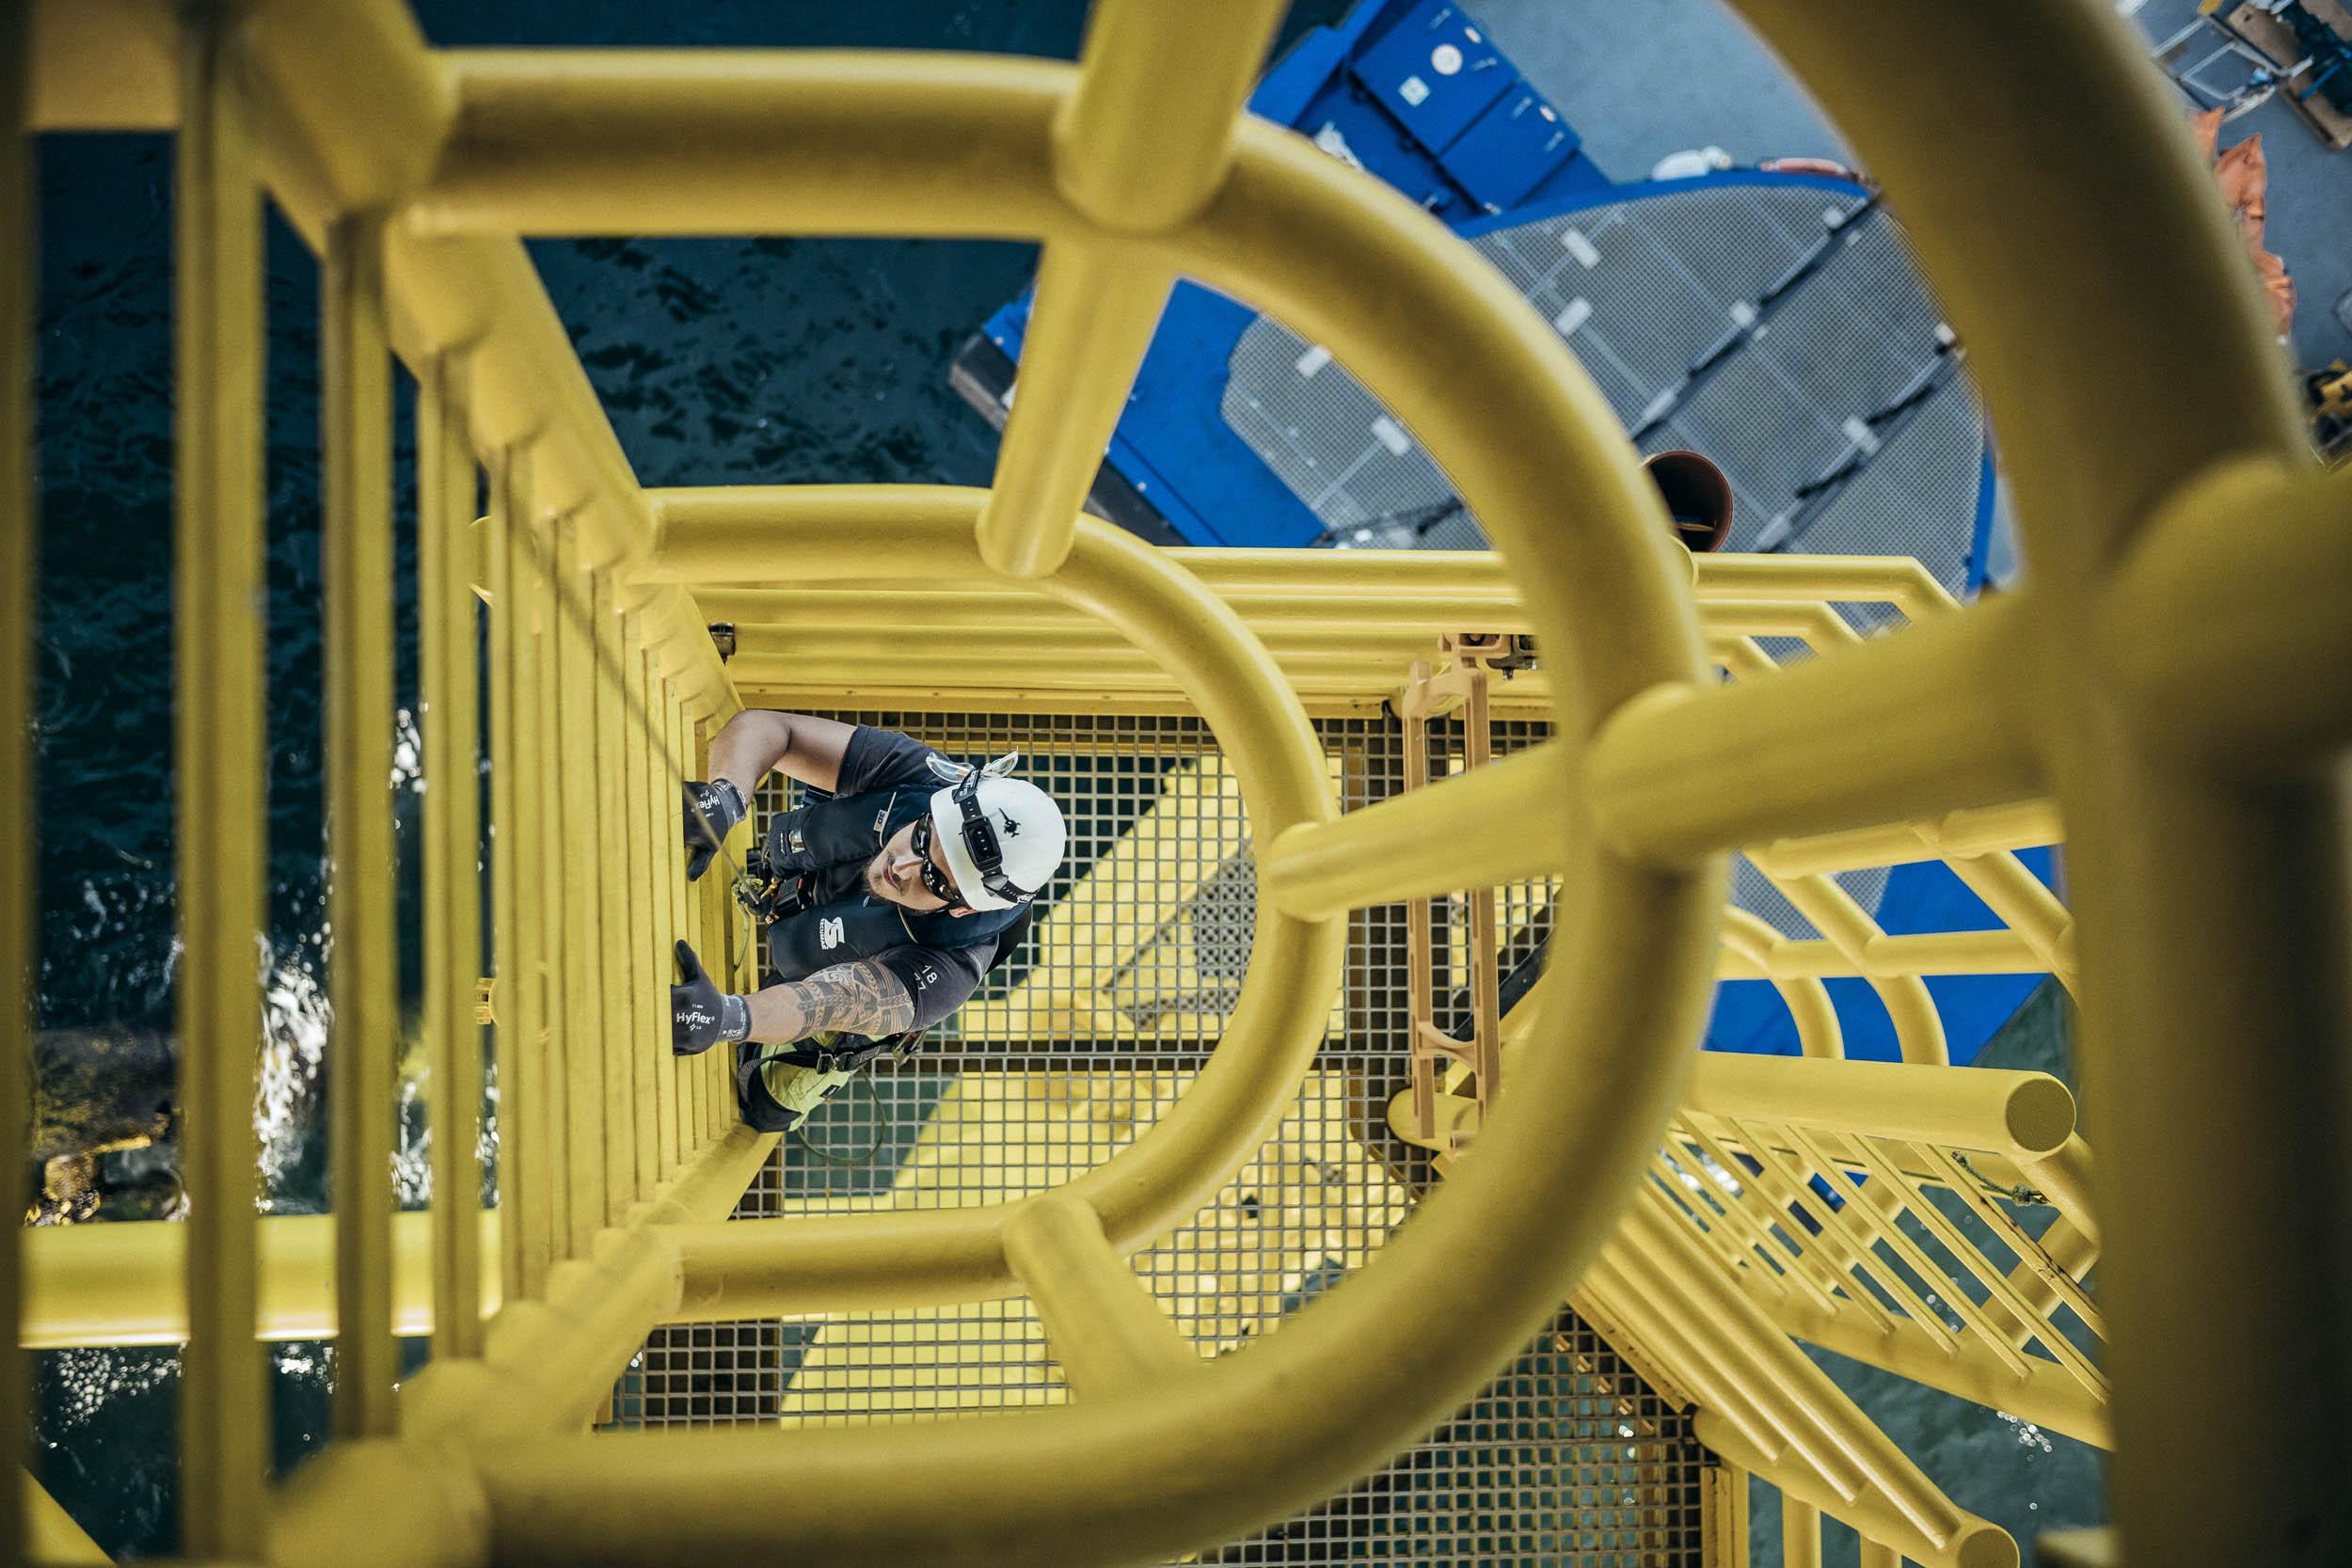 2019-SeifertUebler-EWE-offshore-windpower-031.jpg